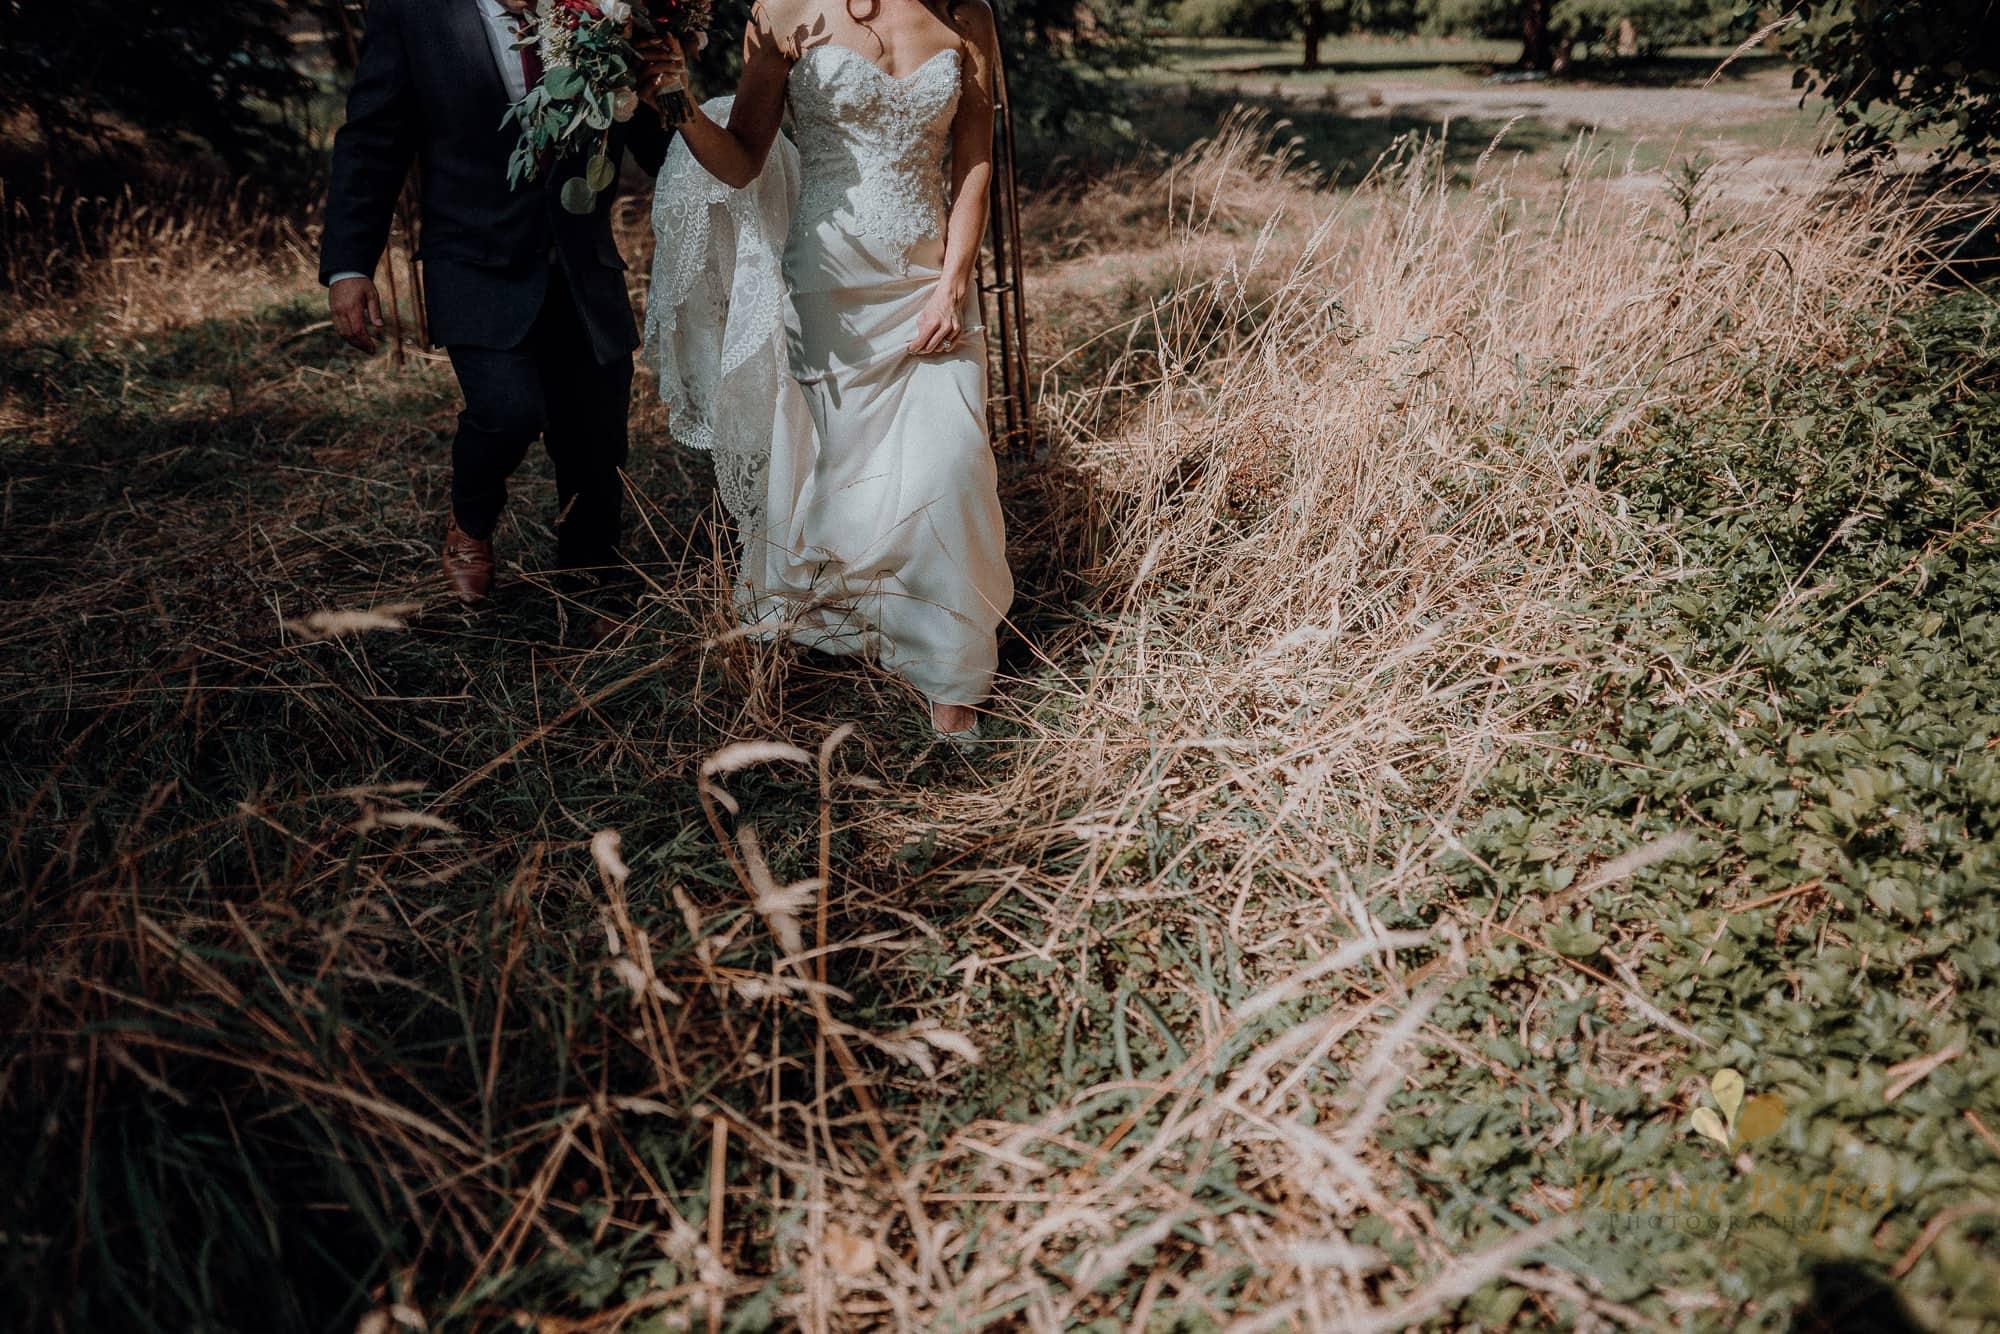 Roseburb Park wedding of Casey 2952